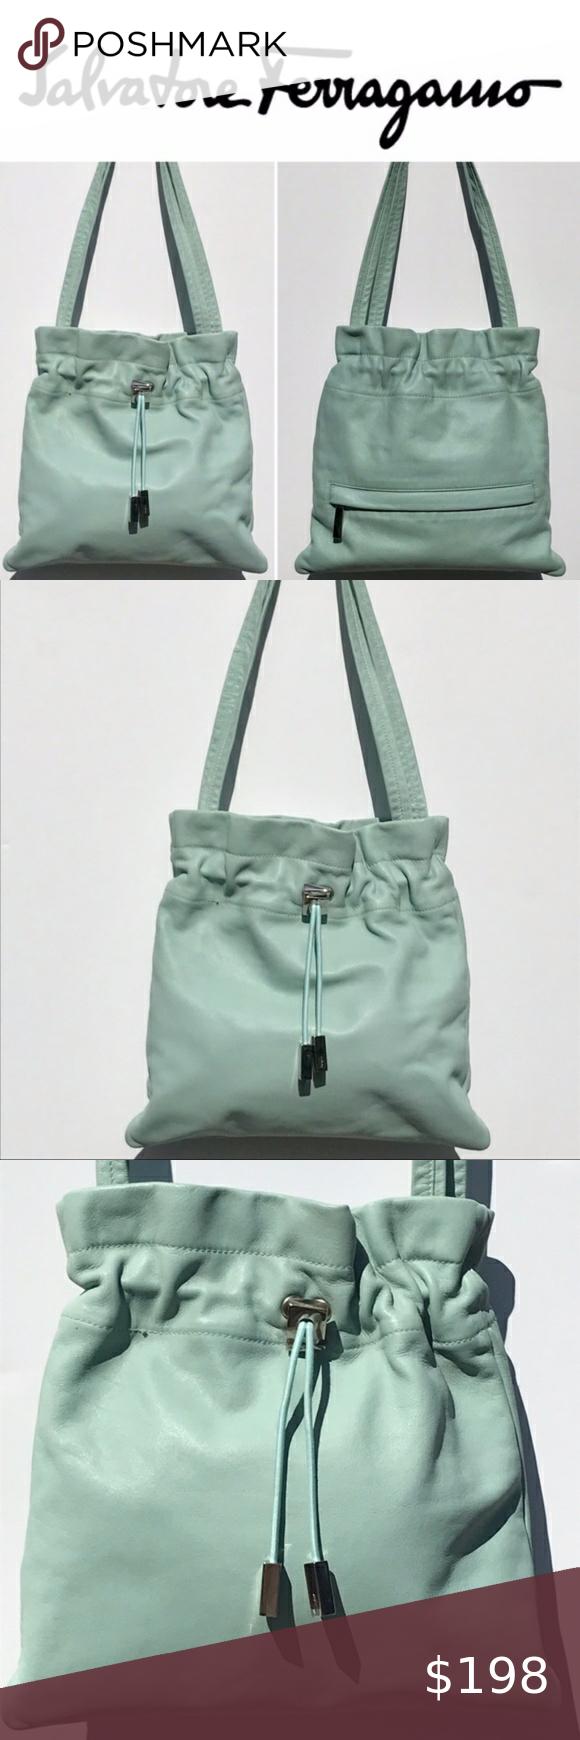 Light Blue Small Drawstring Bag